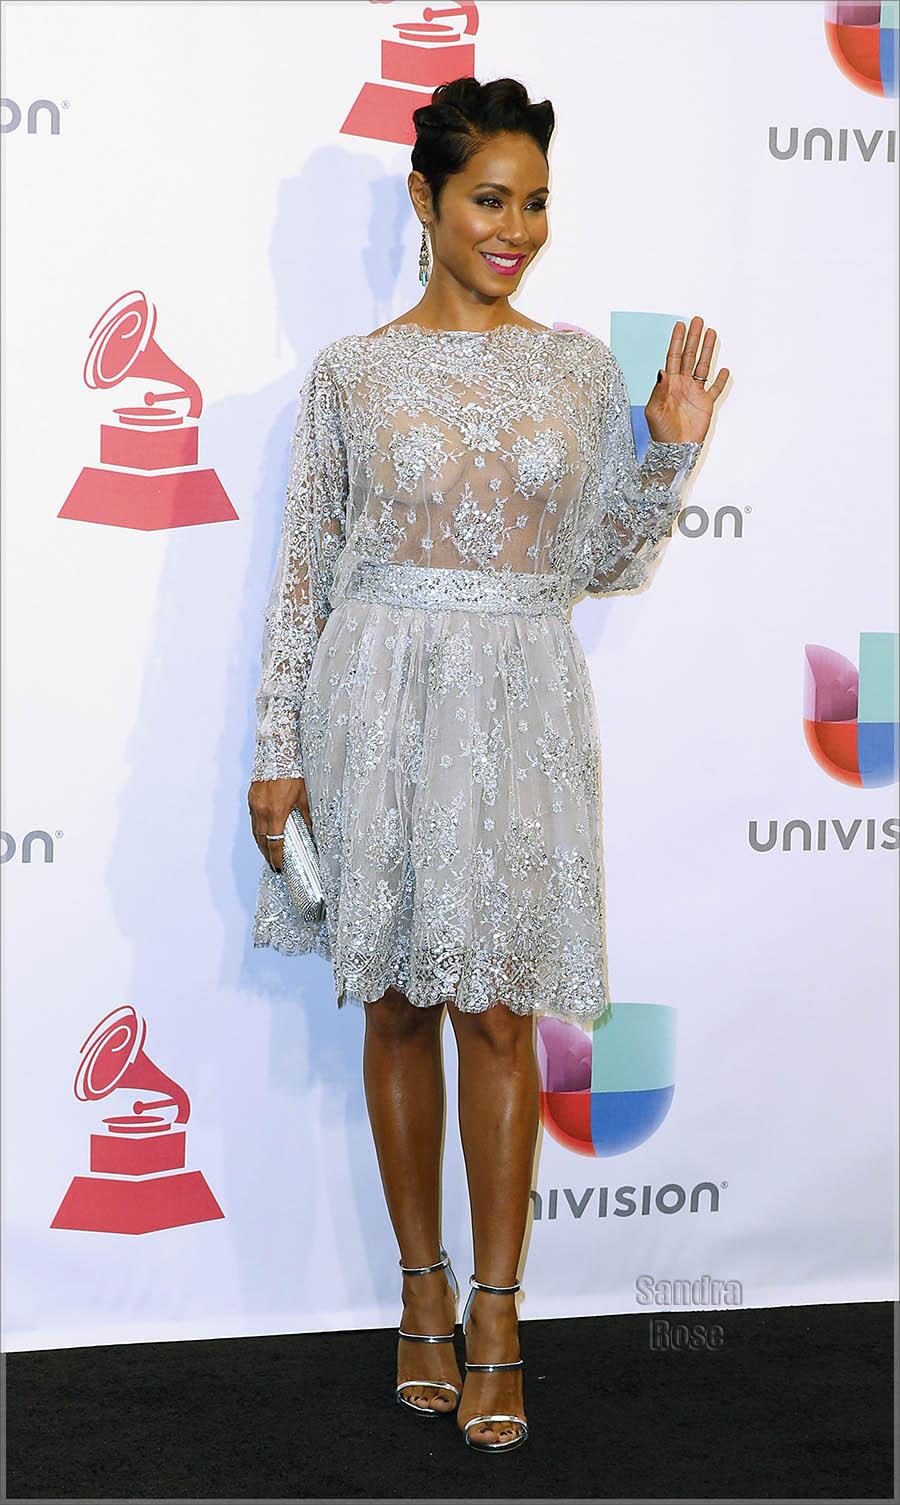 2015 Latin Grammy Awards Press Room